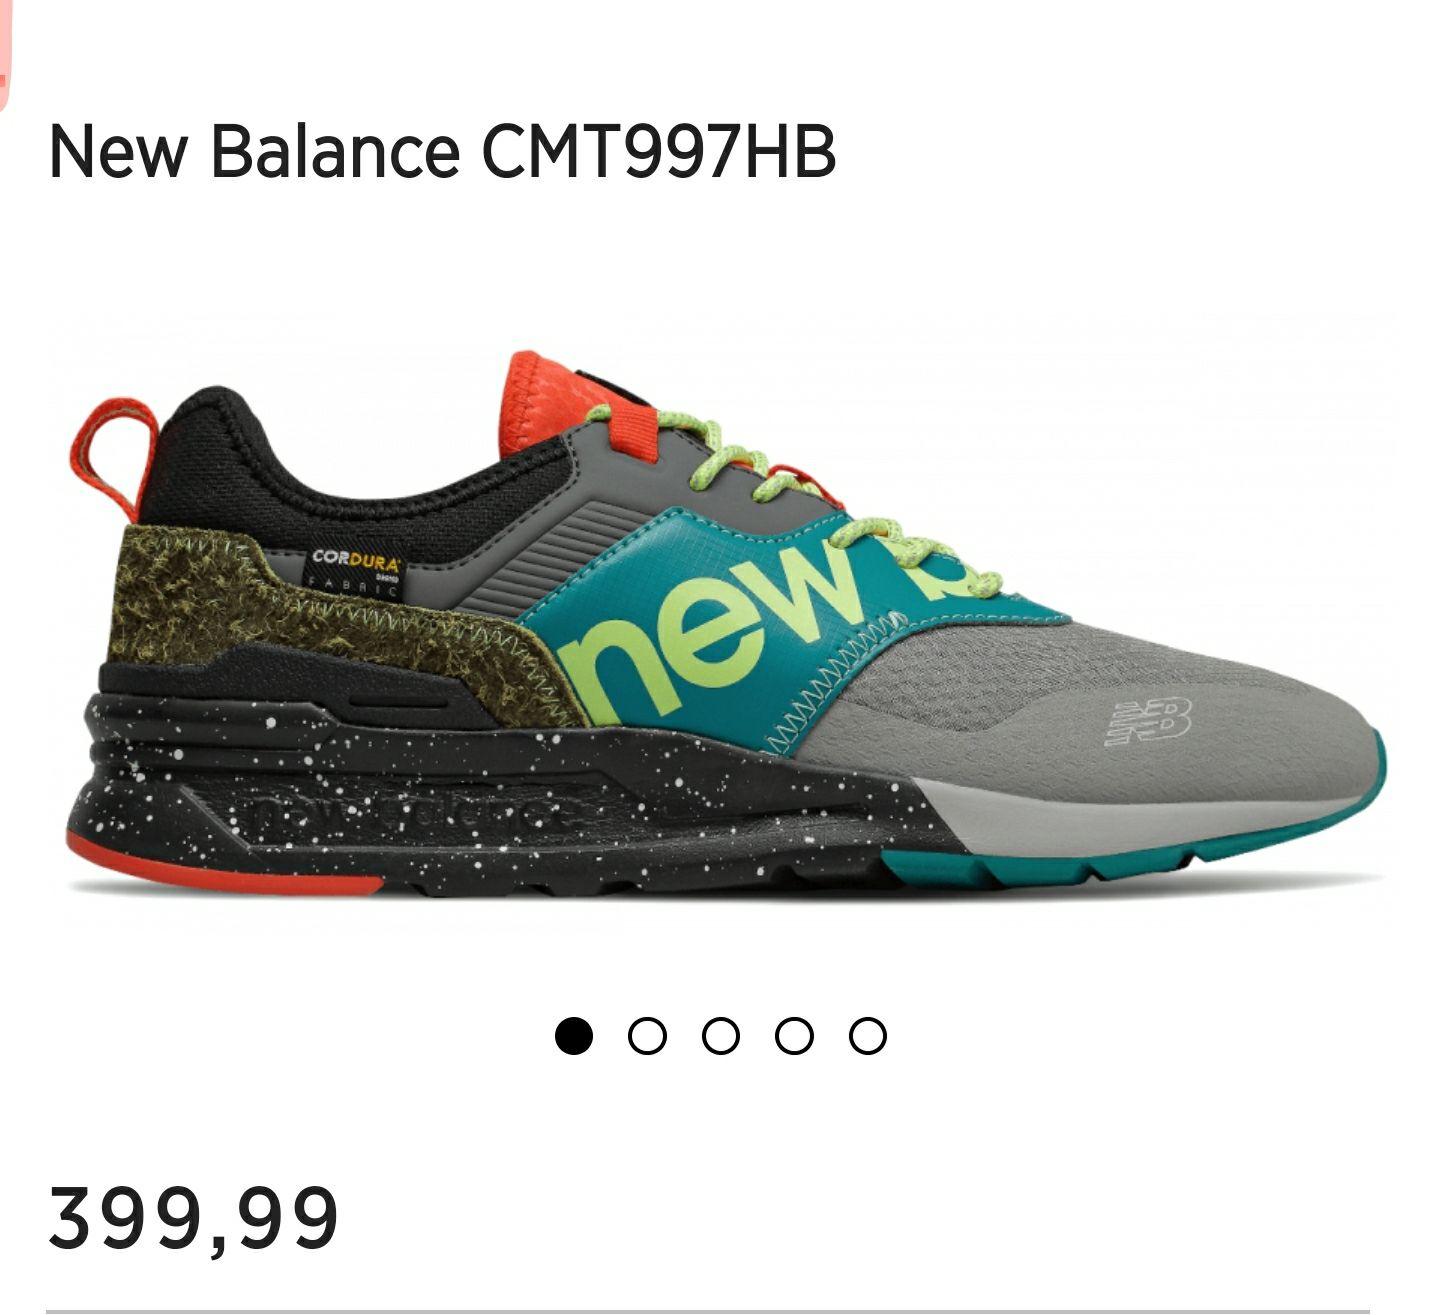 Buty New Balance CMT997HB